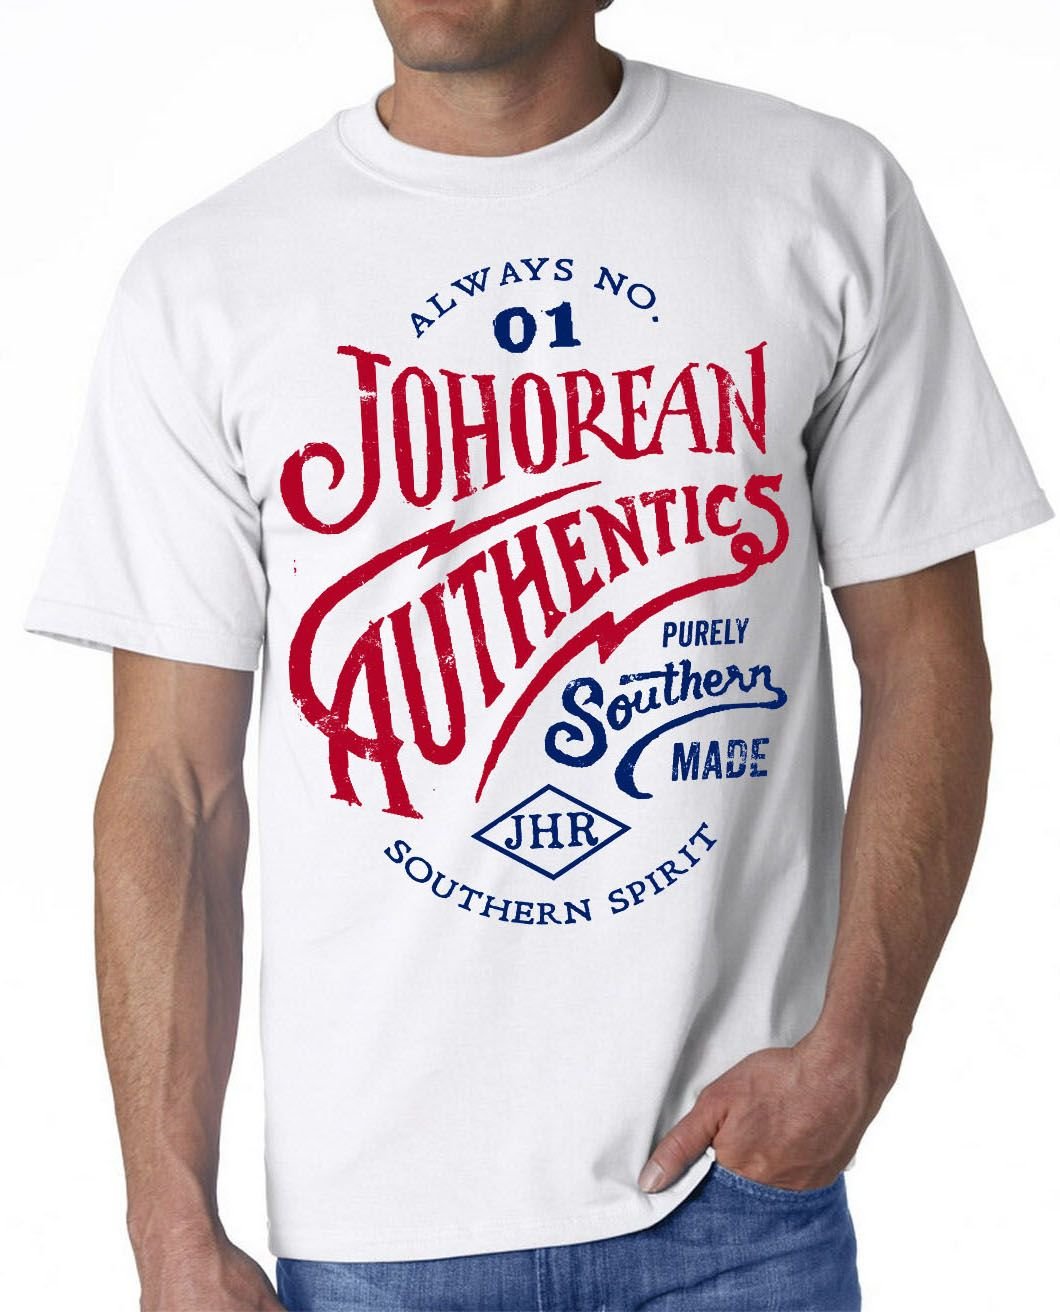 jhr classic southern white t shirts shirt design inspiration tee shirt designs best t shirt designs pinterest